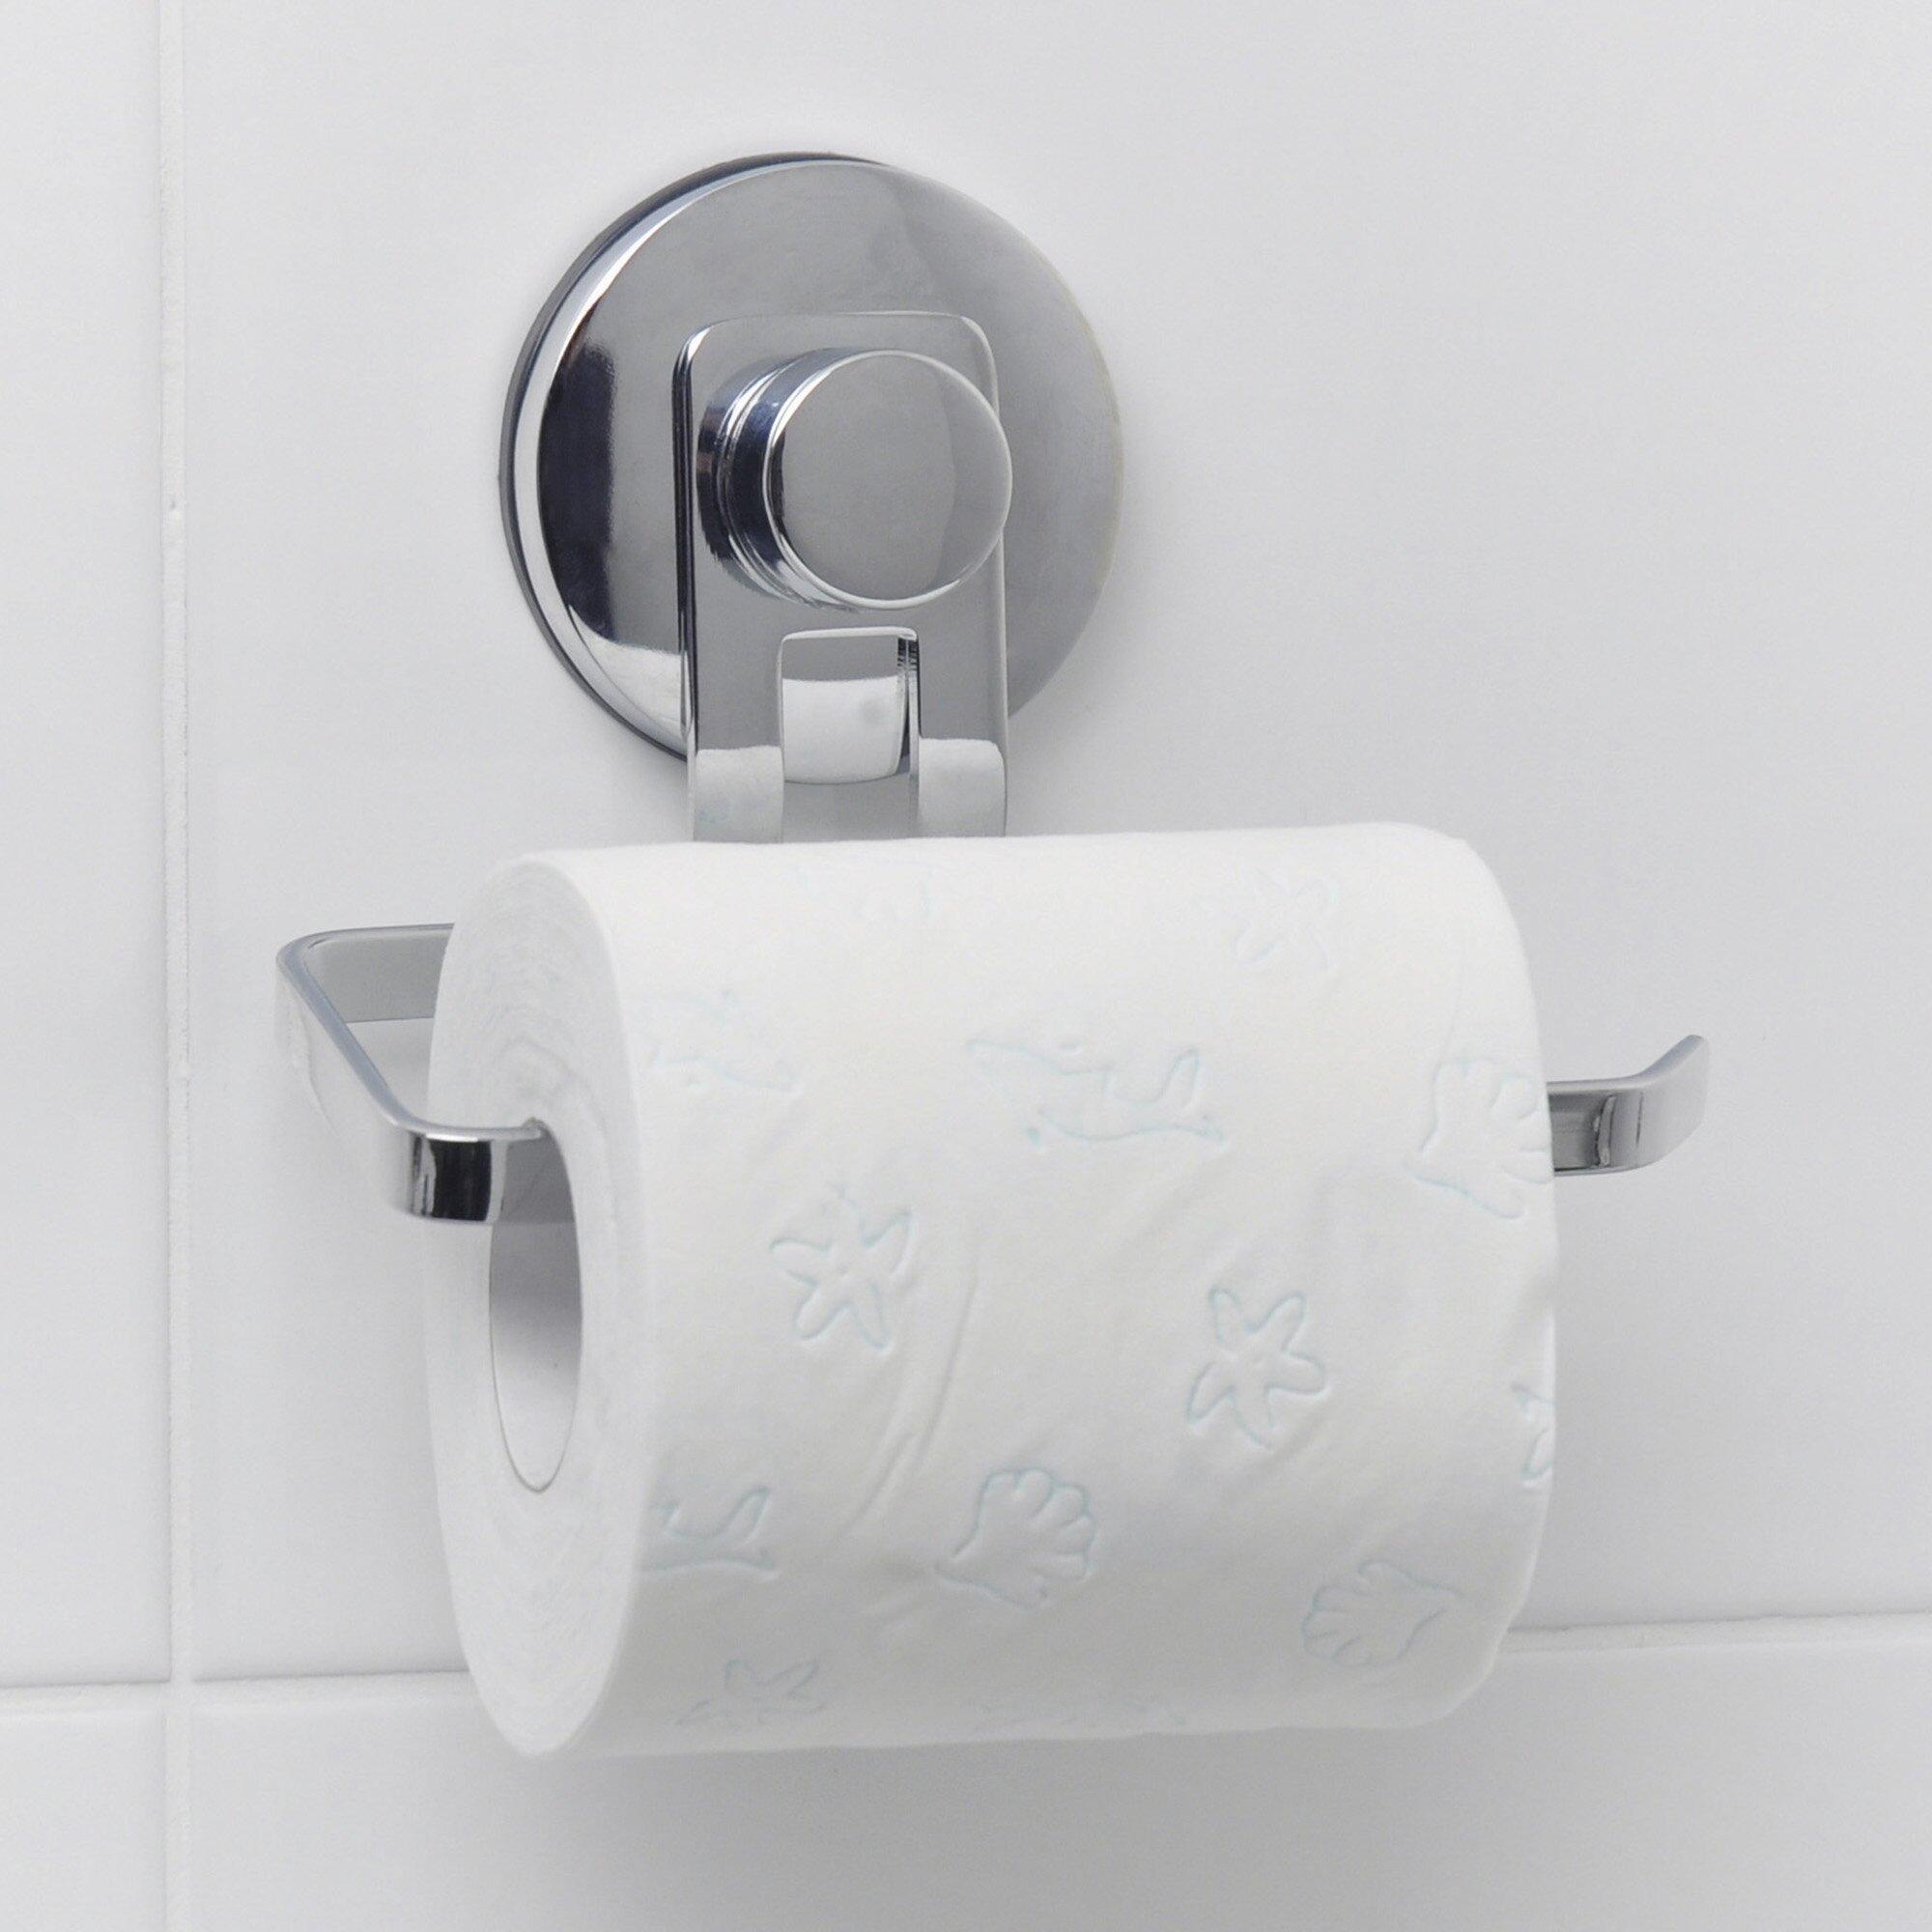 everloc solutions wall mounted toilet paper holder reviews wayfair. Black Bedroom Furniture Sets. Home Design Ideas